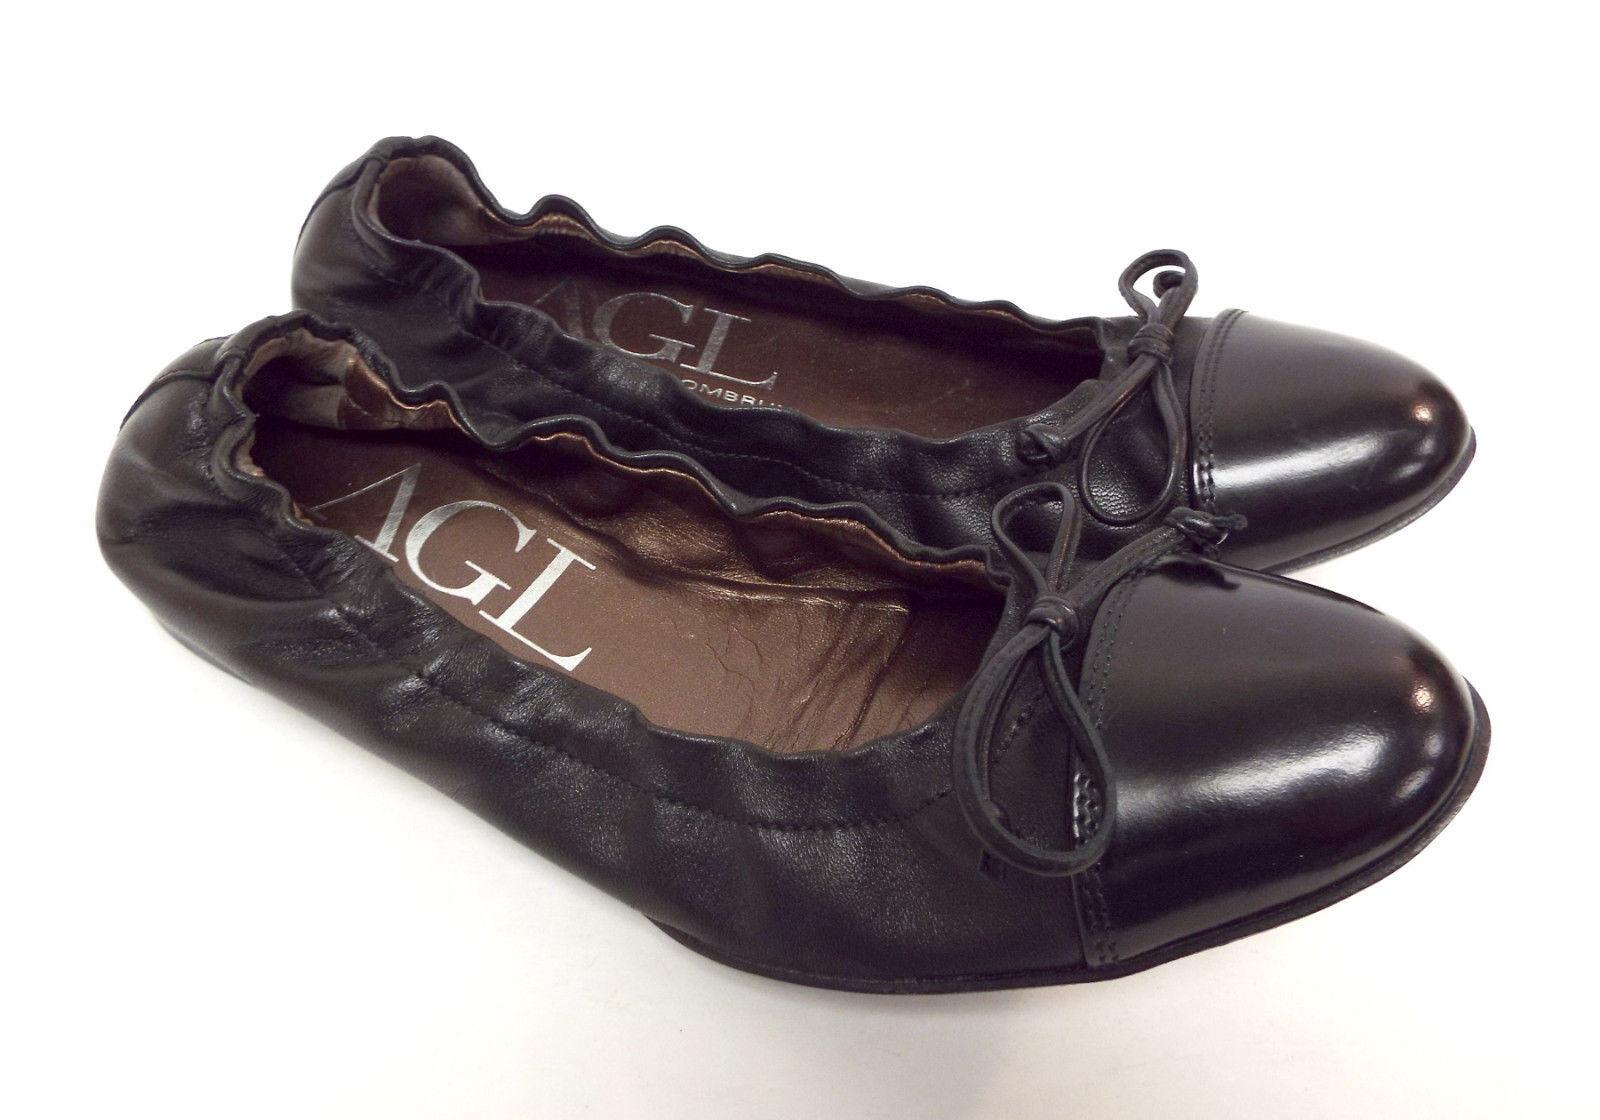 Attilio Giusti Leombruni AGL Size 6 SLEEK Black Ballet Flats Shoes 36